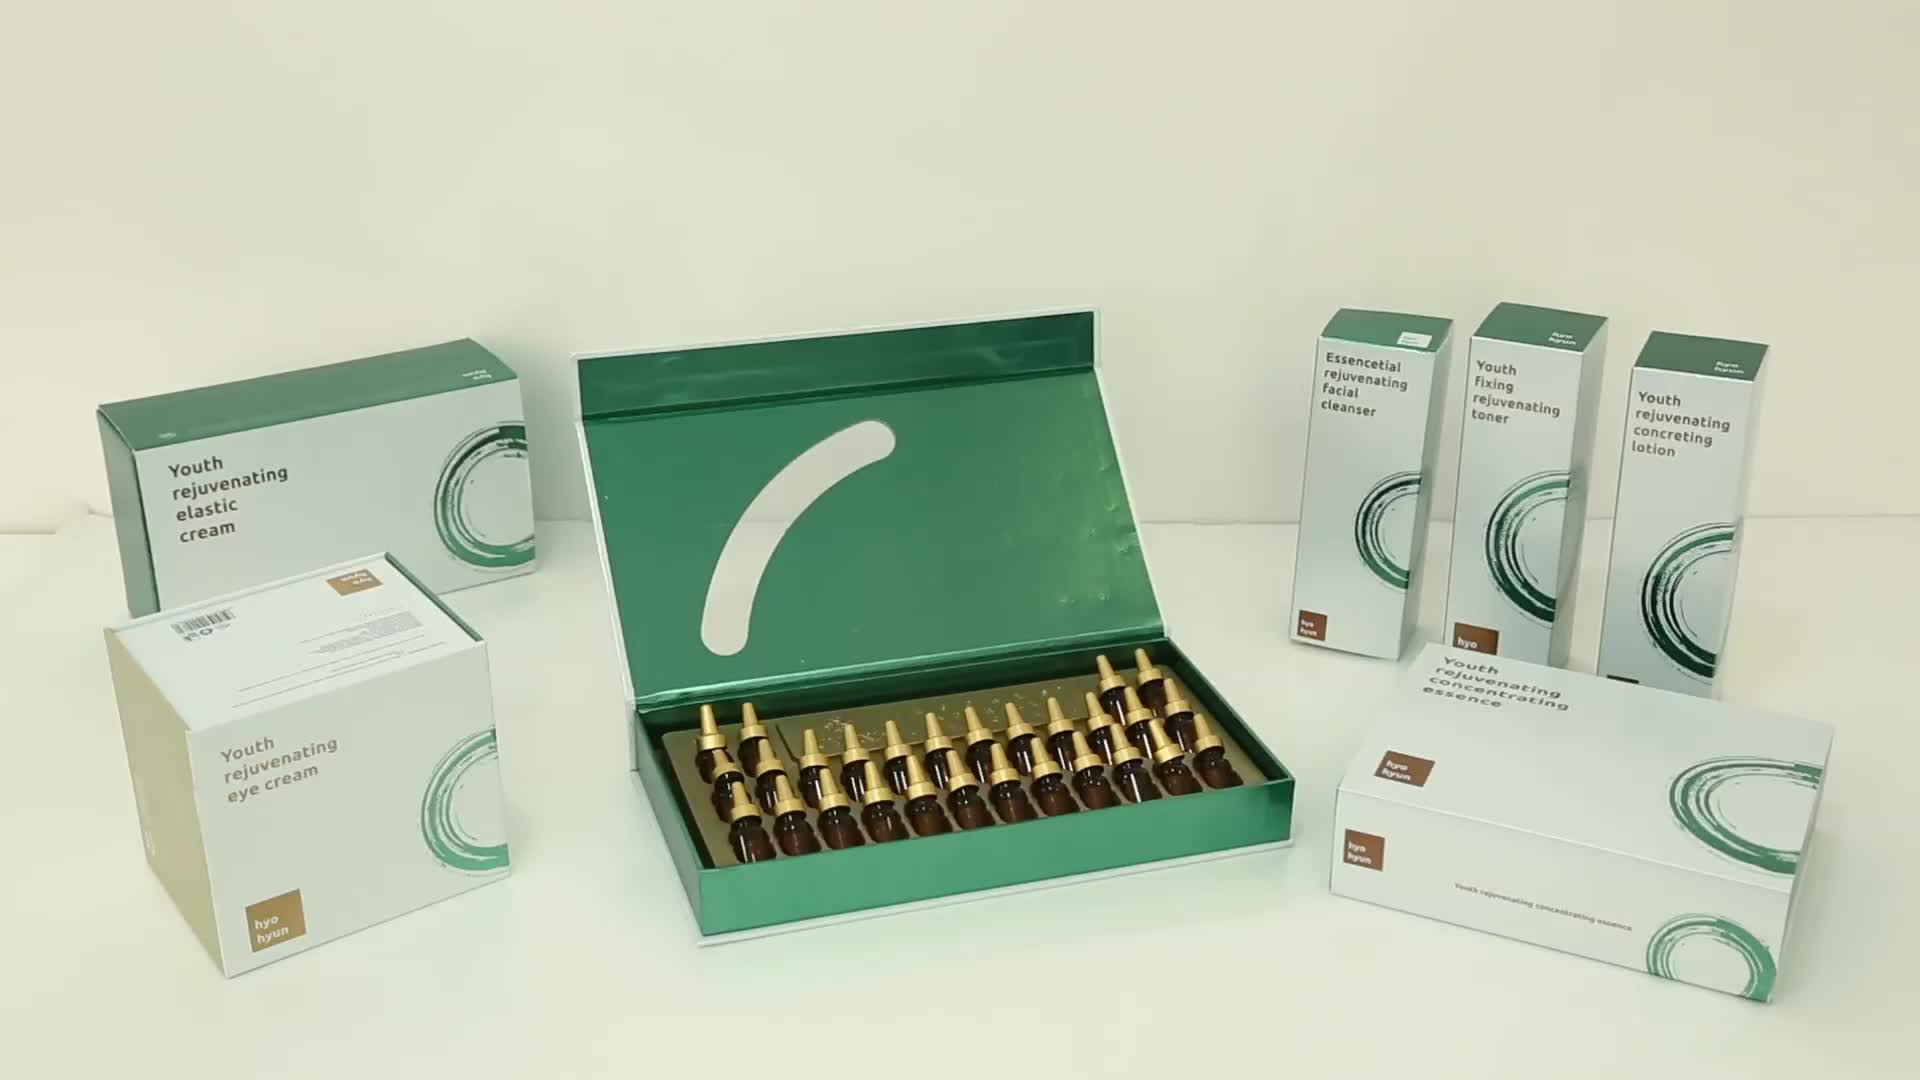 Extract zeldzame geneeskrachtige kruiden Cordyceps sinensis ginseng gezicht wassen gezicht foam cleanser